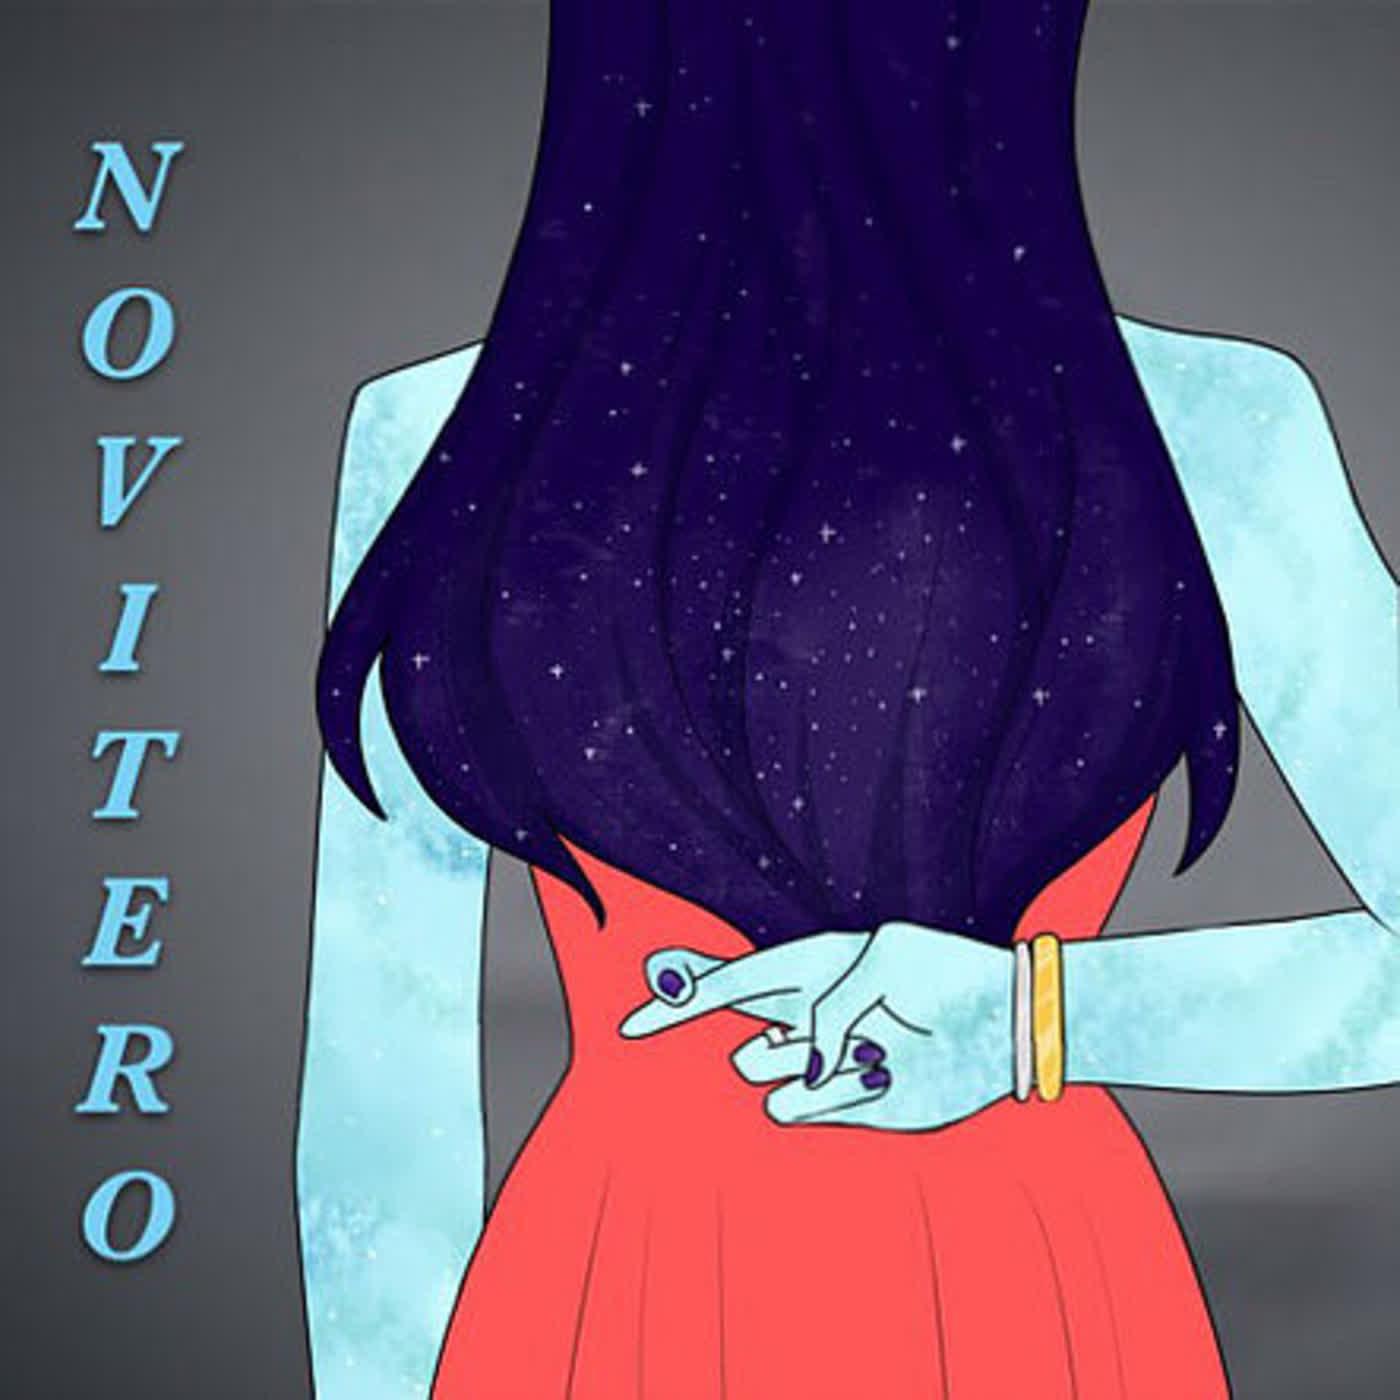 Episode Eleven: The Novitero